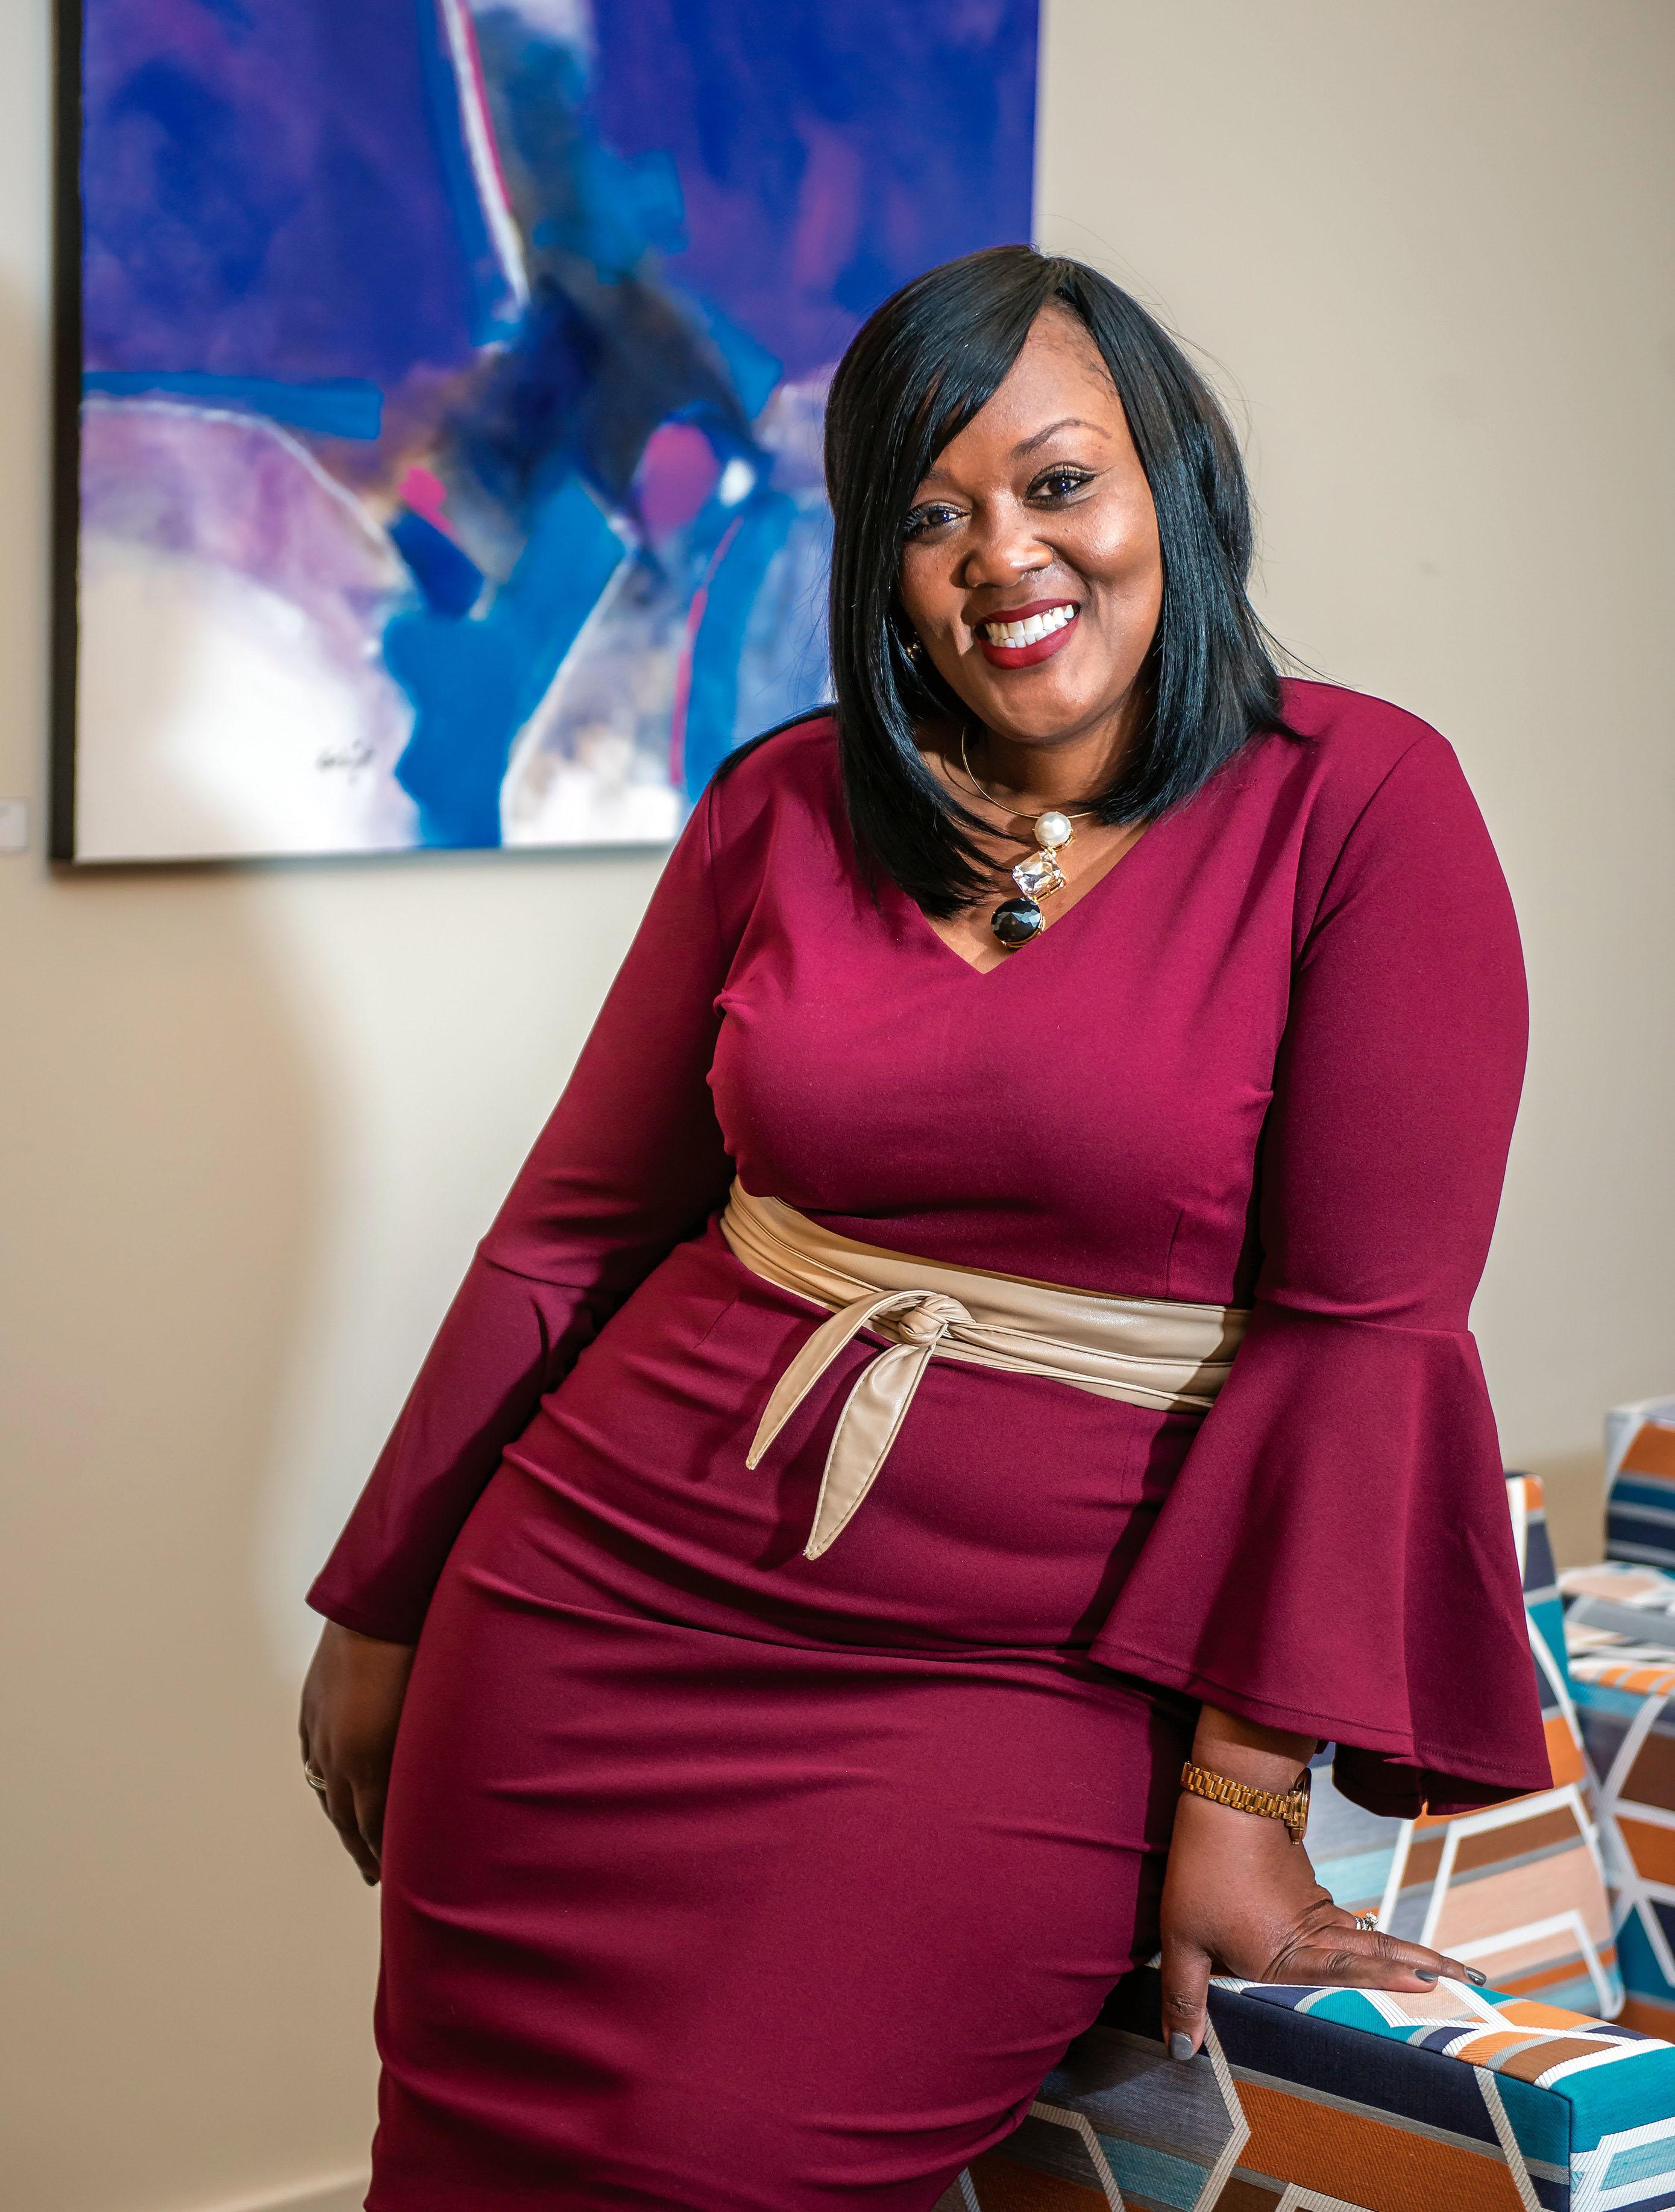 YWCA Women of Distinction Narketta Sparkman-Key